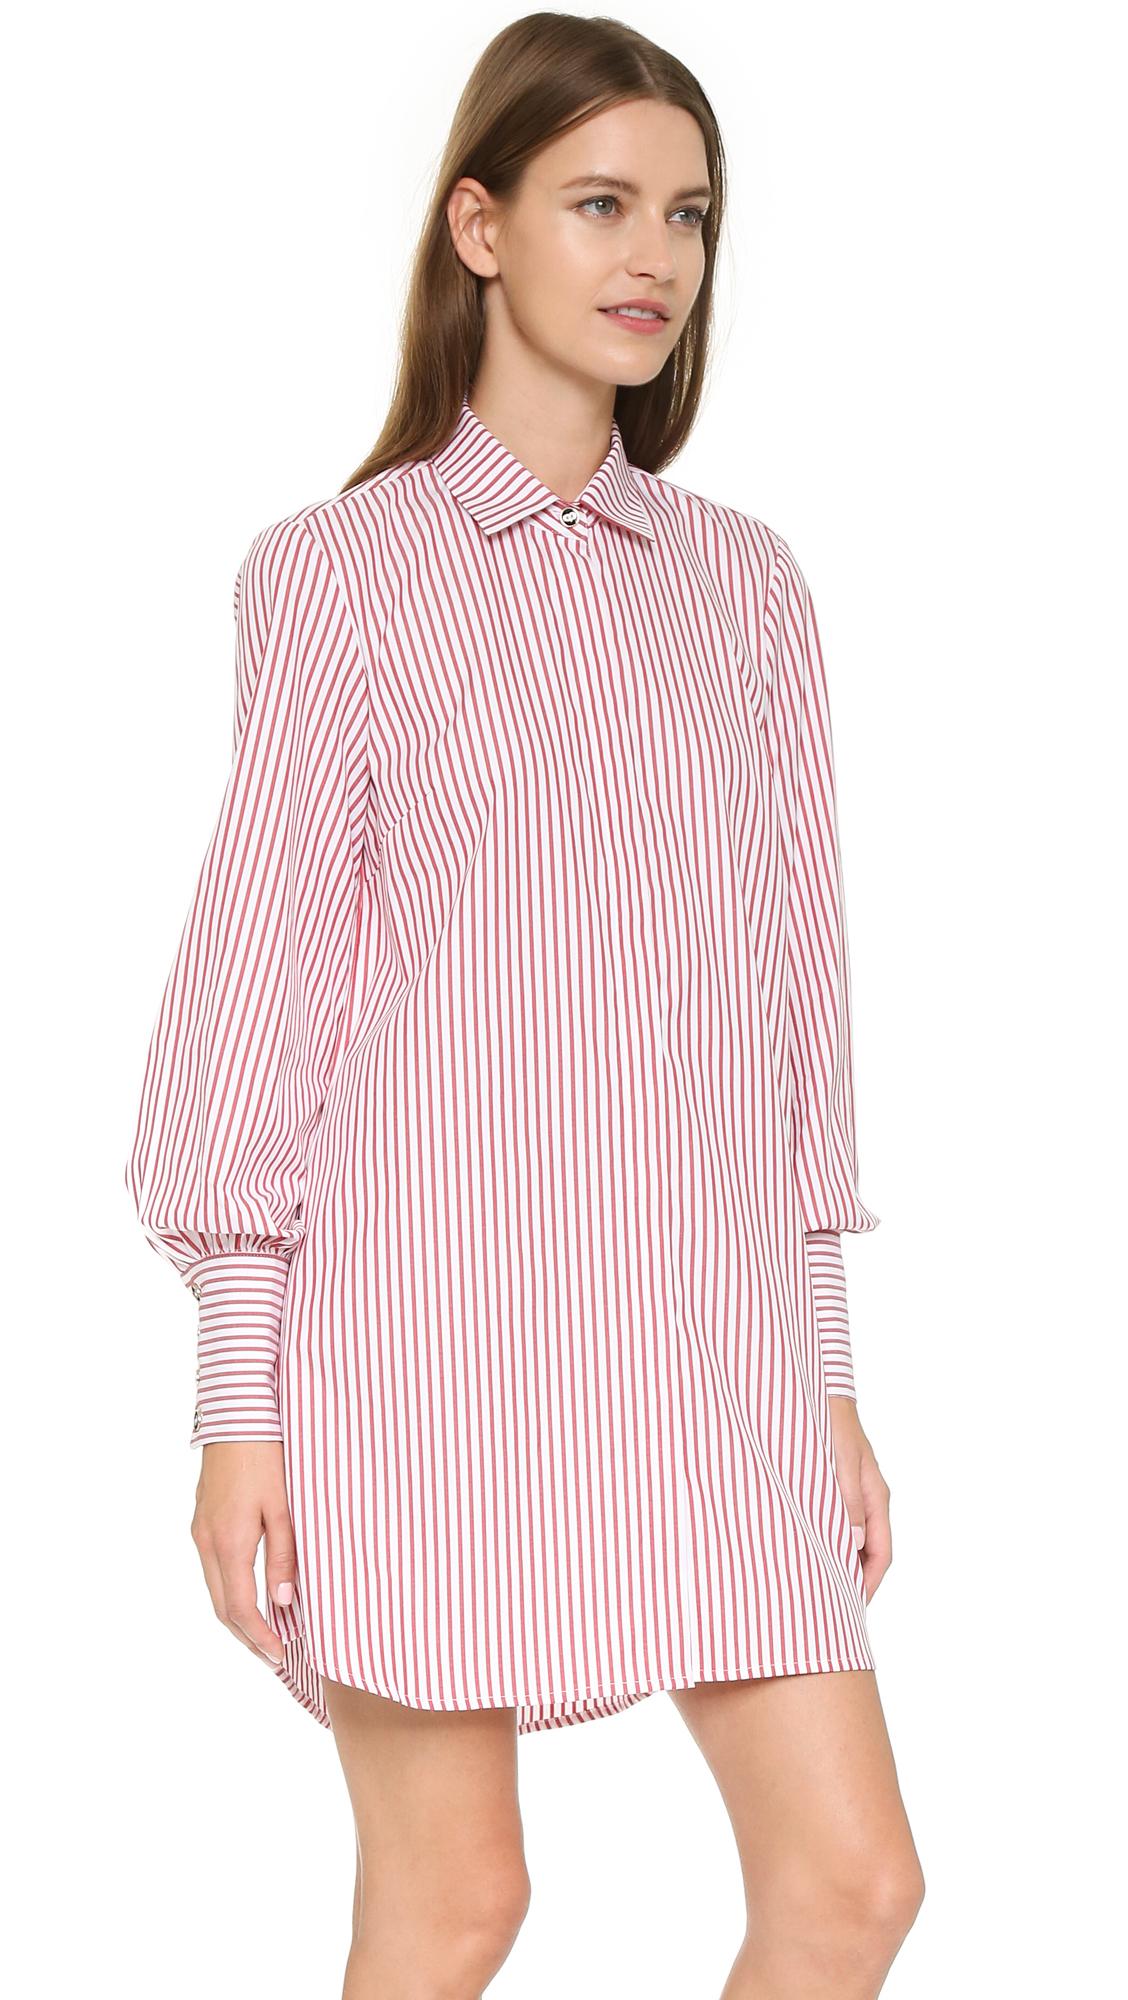 67a927b825f Caroline Constas Boyfriend Chemise Shirtdress - Red Stripe in Red - Lyst